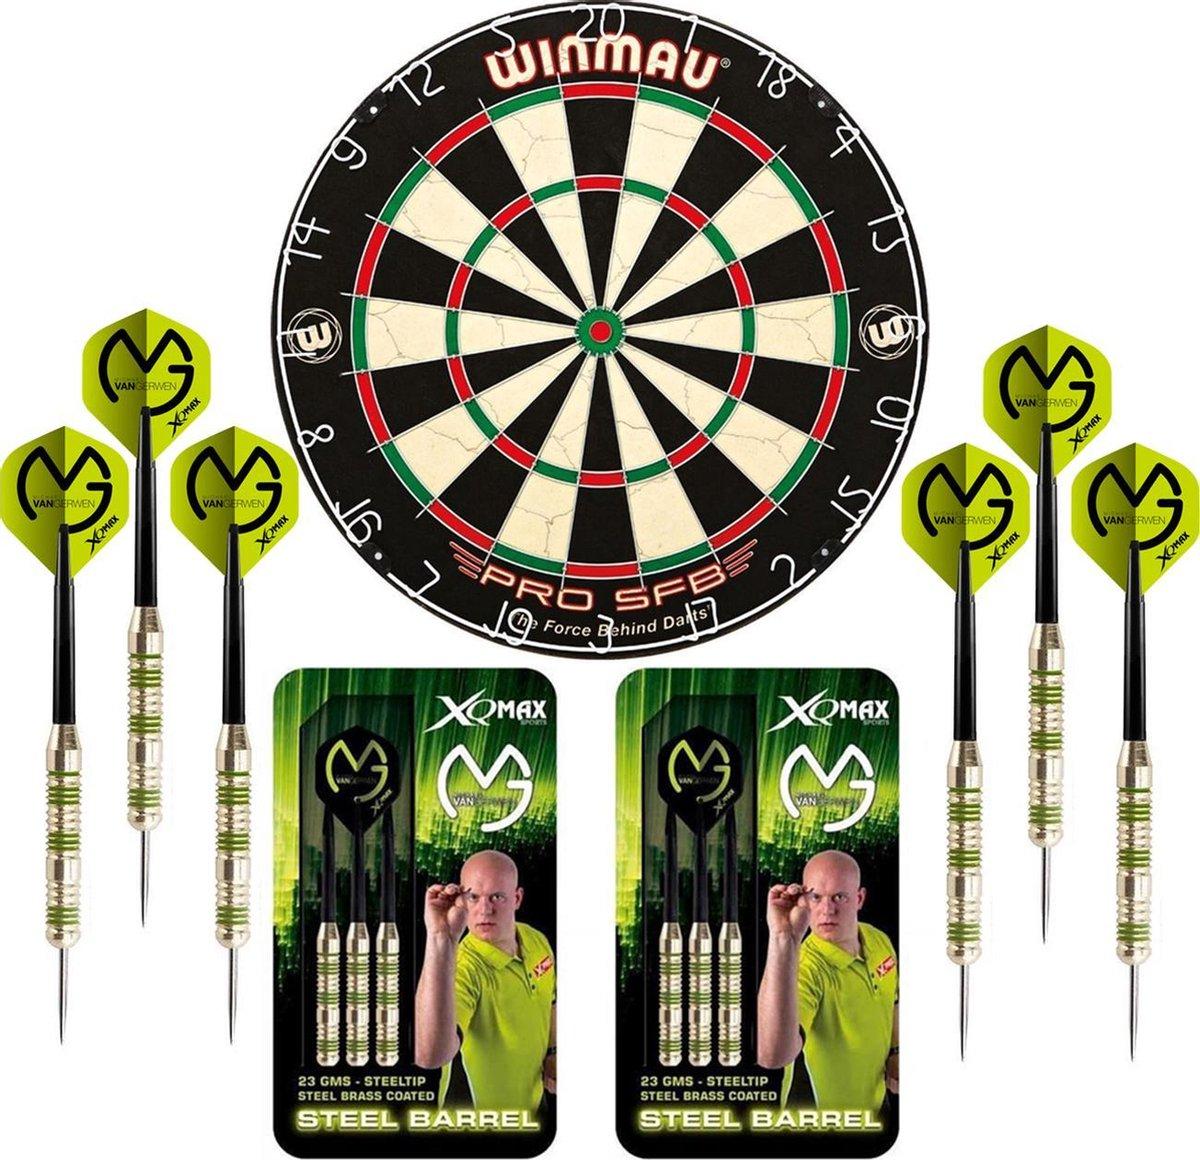 Dragon Darts Michael van Gerwen Octane set - dartbord - 2 sets - dartpijlen - dart shafts - dart flights - Winmau PRO SFB